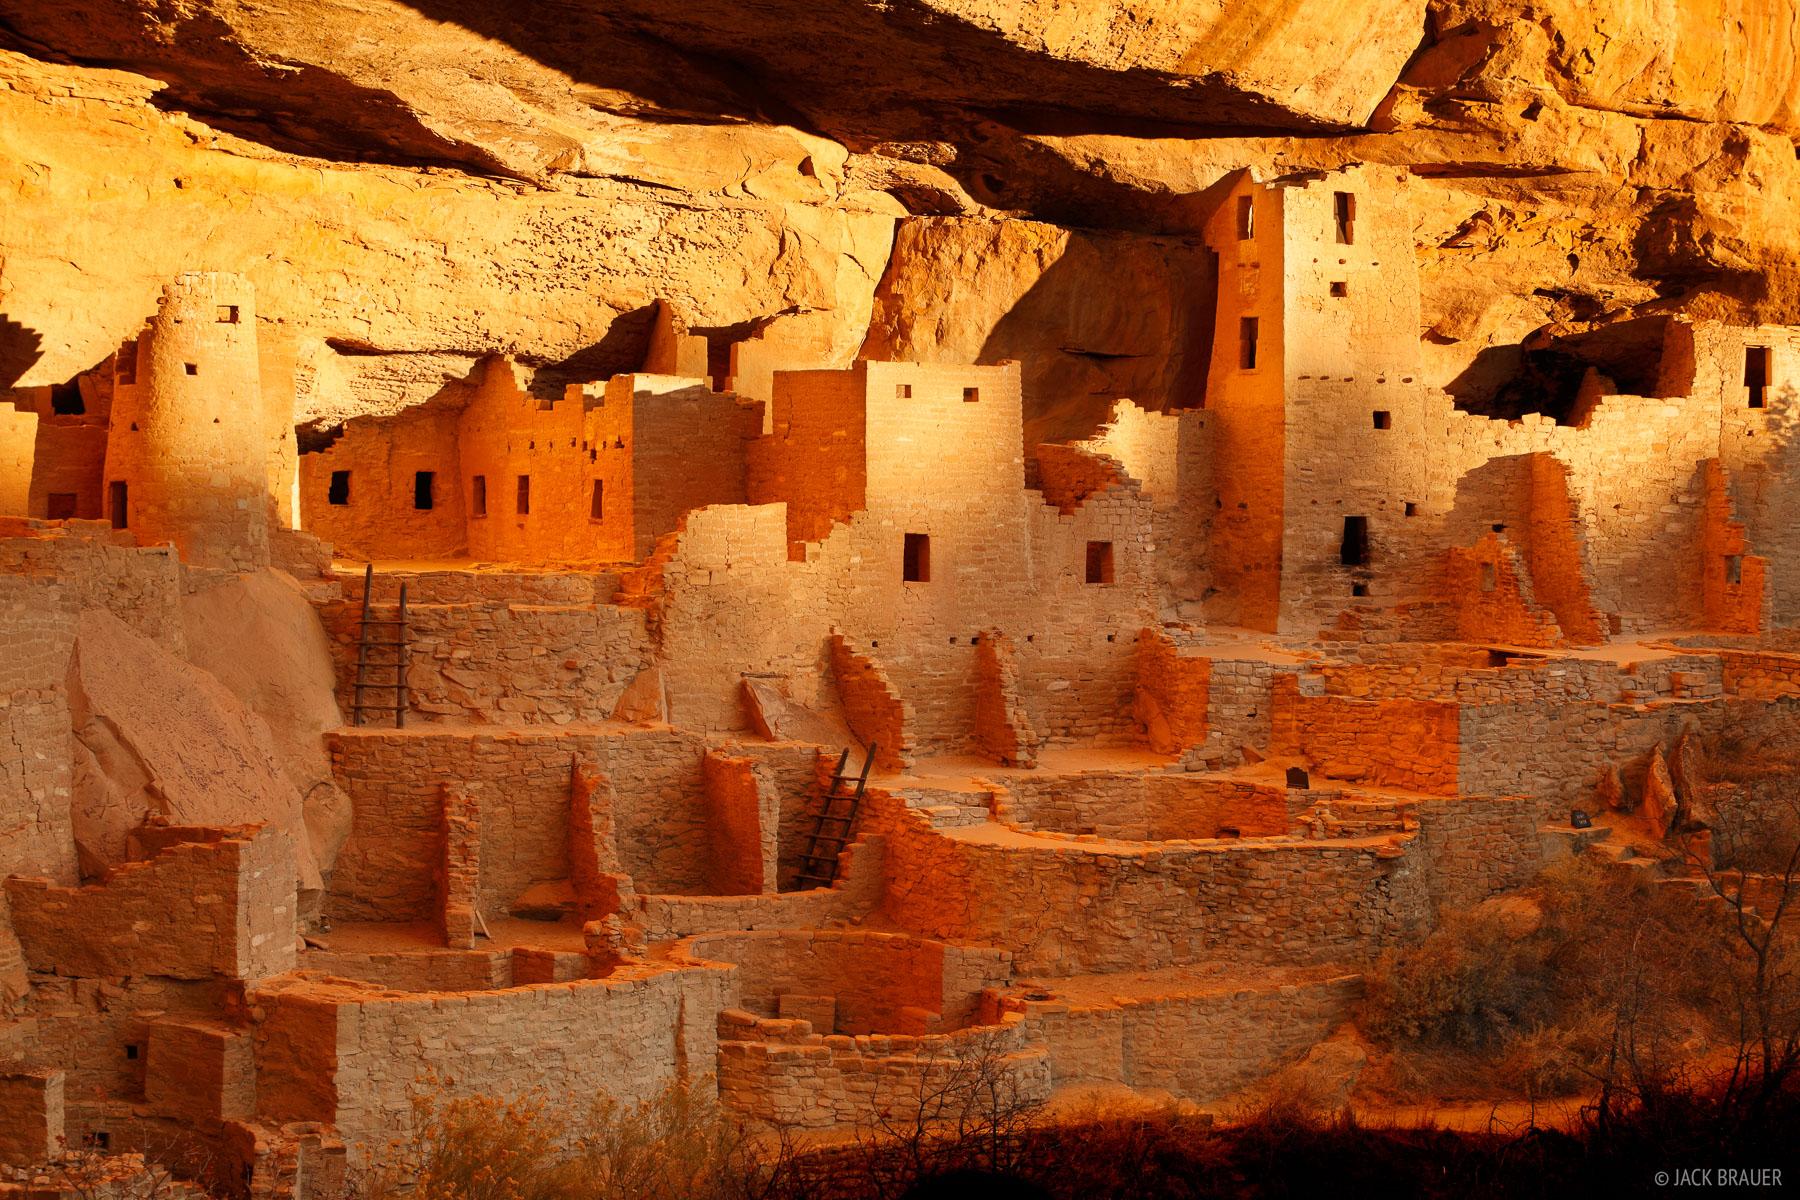 Cliff Palace, Mesa Verde, cliff dwellings, Ancestral Puebloans, Colorado, photo